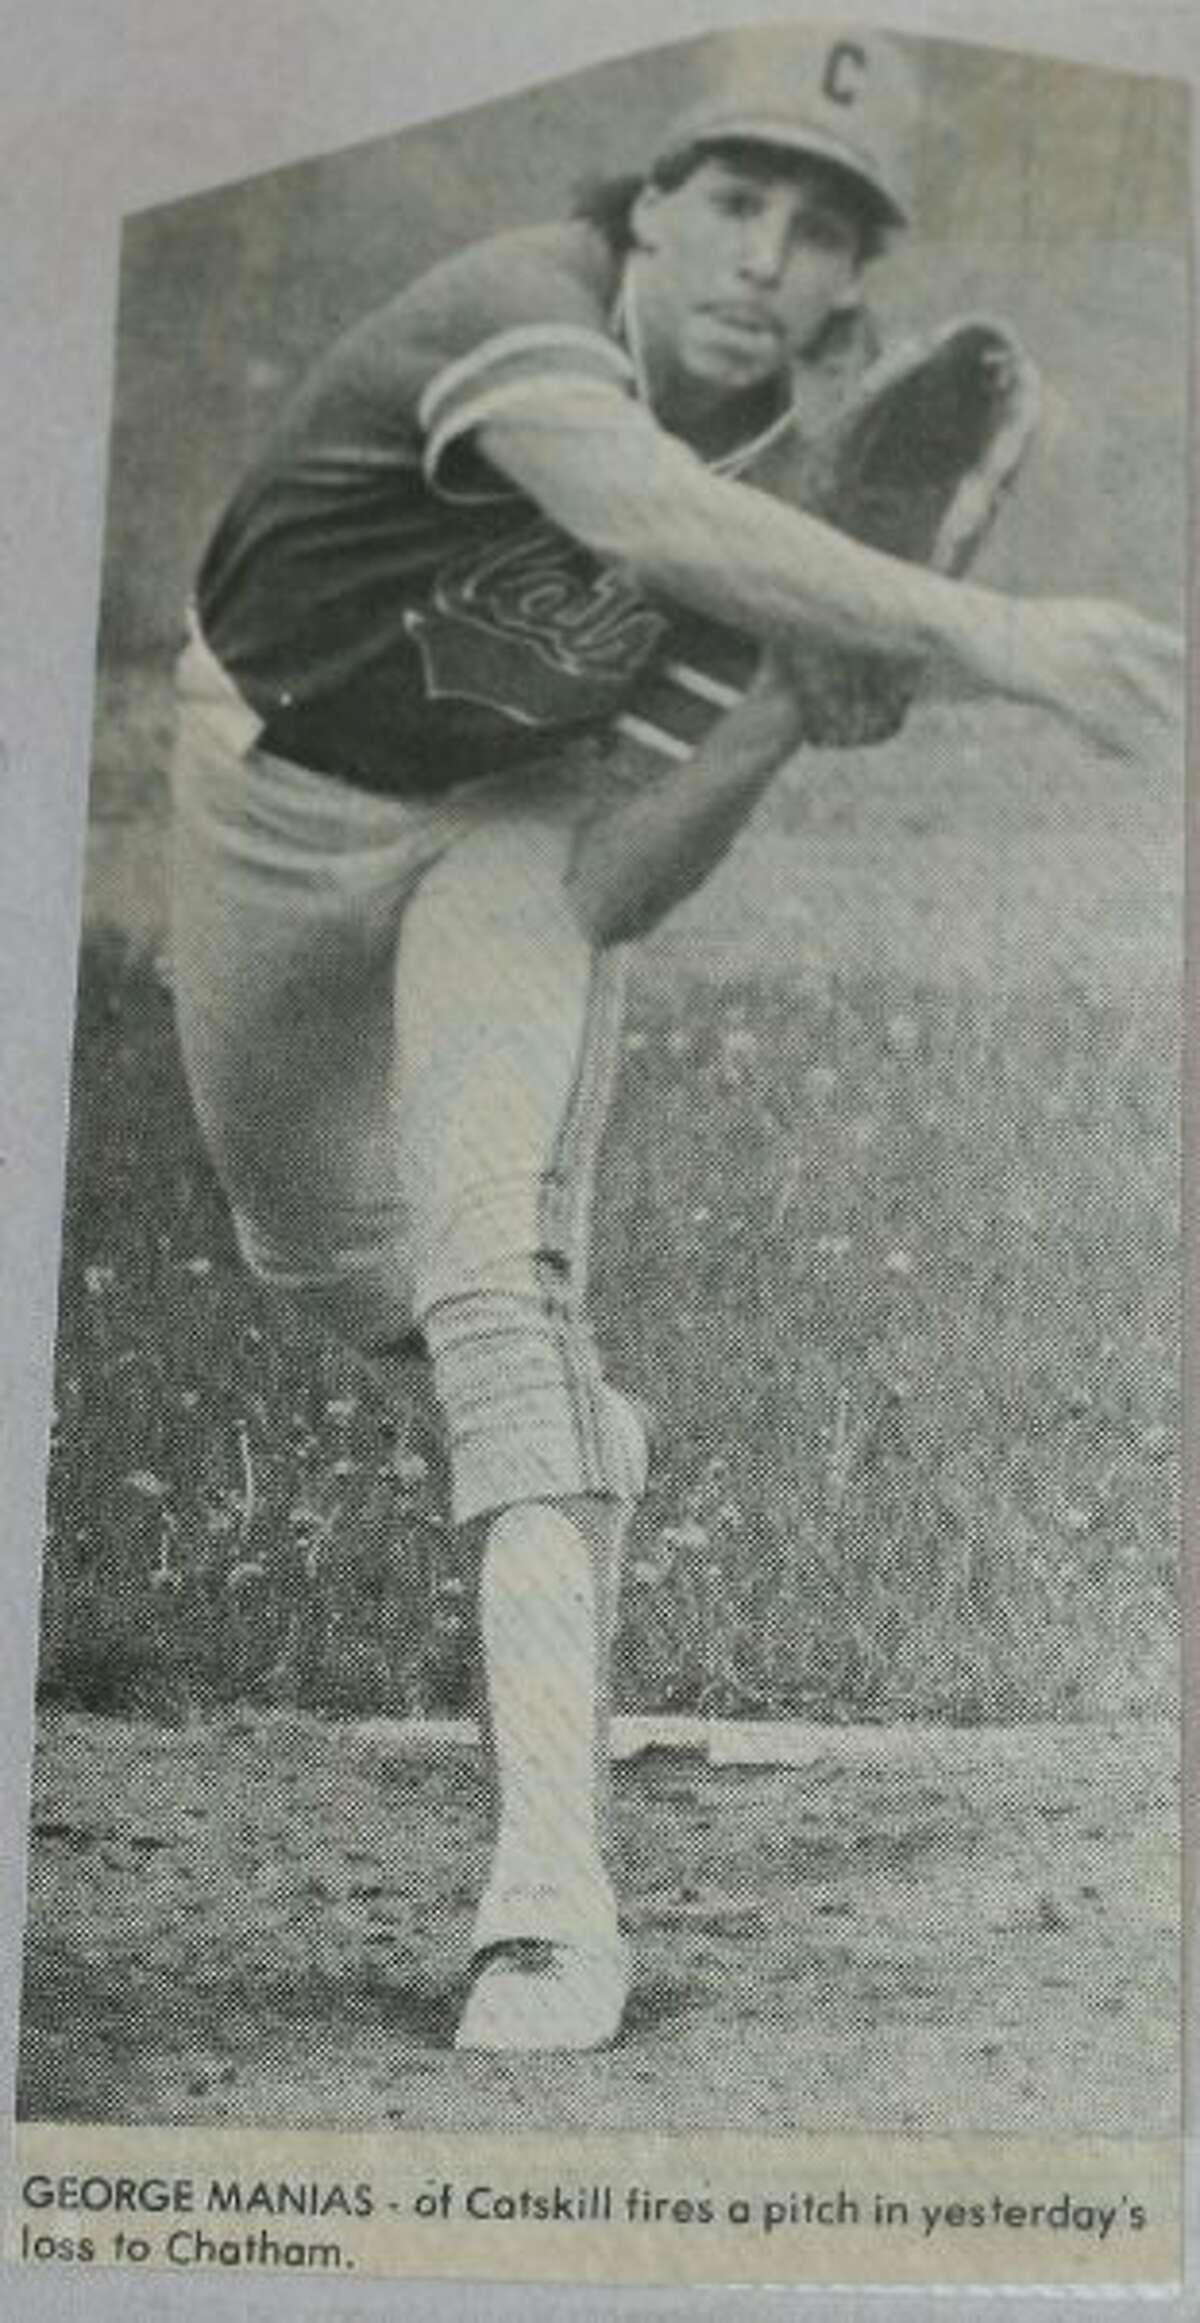 2. I played hockey and baseball in high school and college baseball.